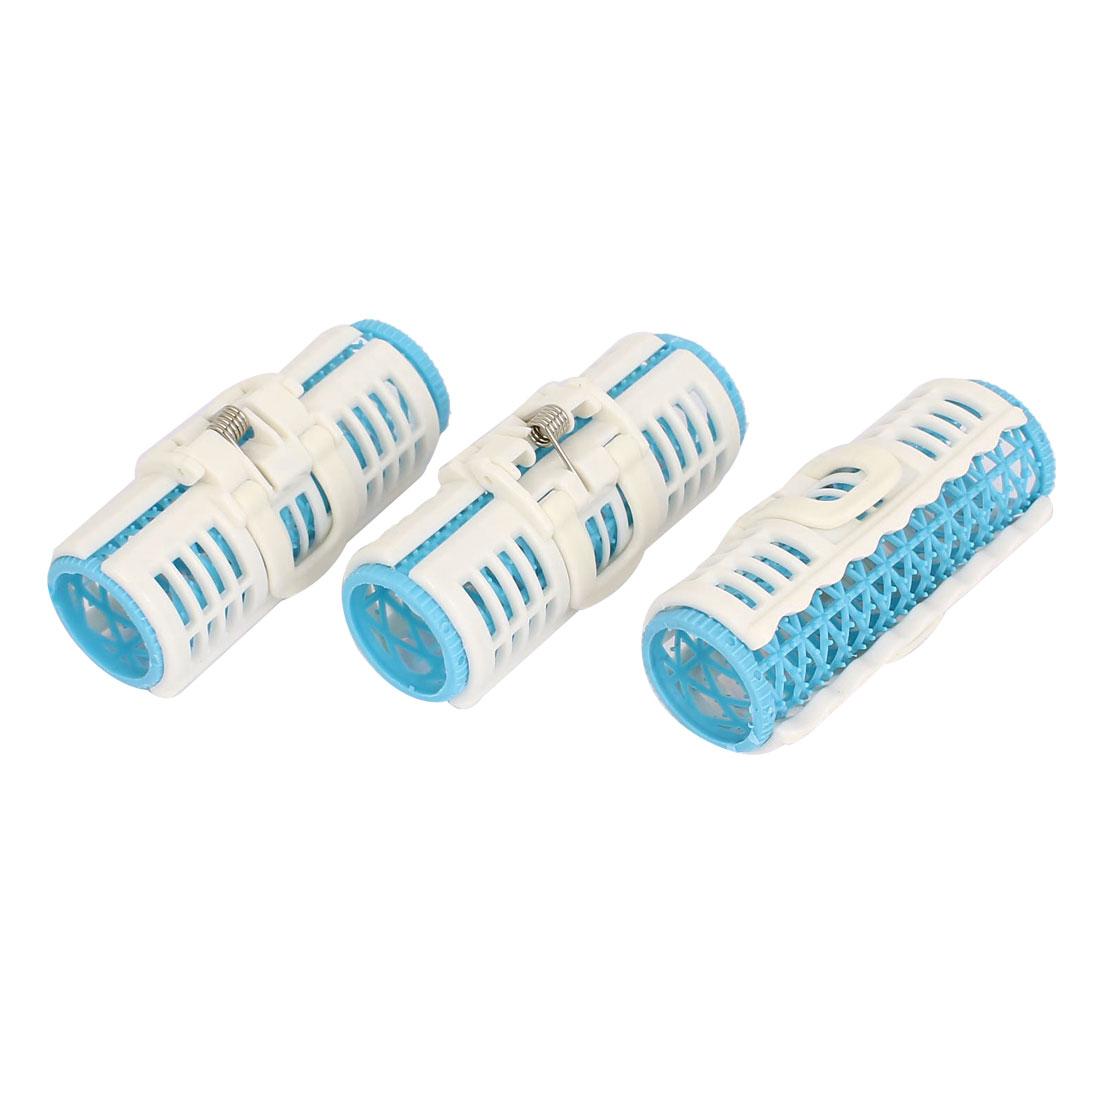 3pcs Plastic Women Hair Curler Roller Cling Clip Salon Tool Blue White